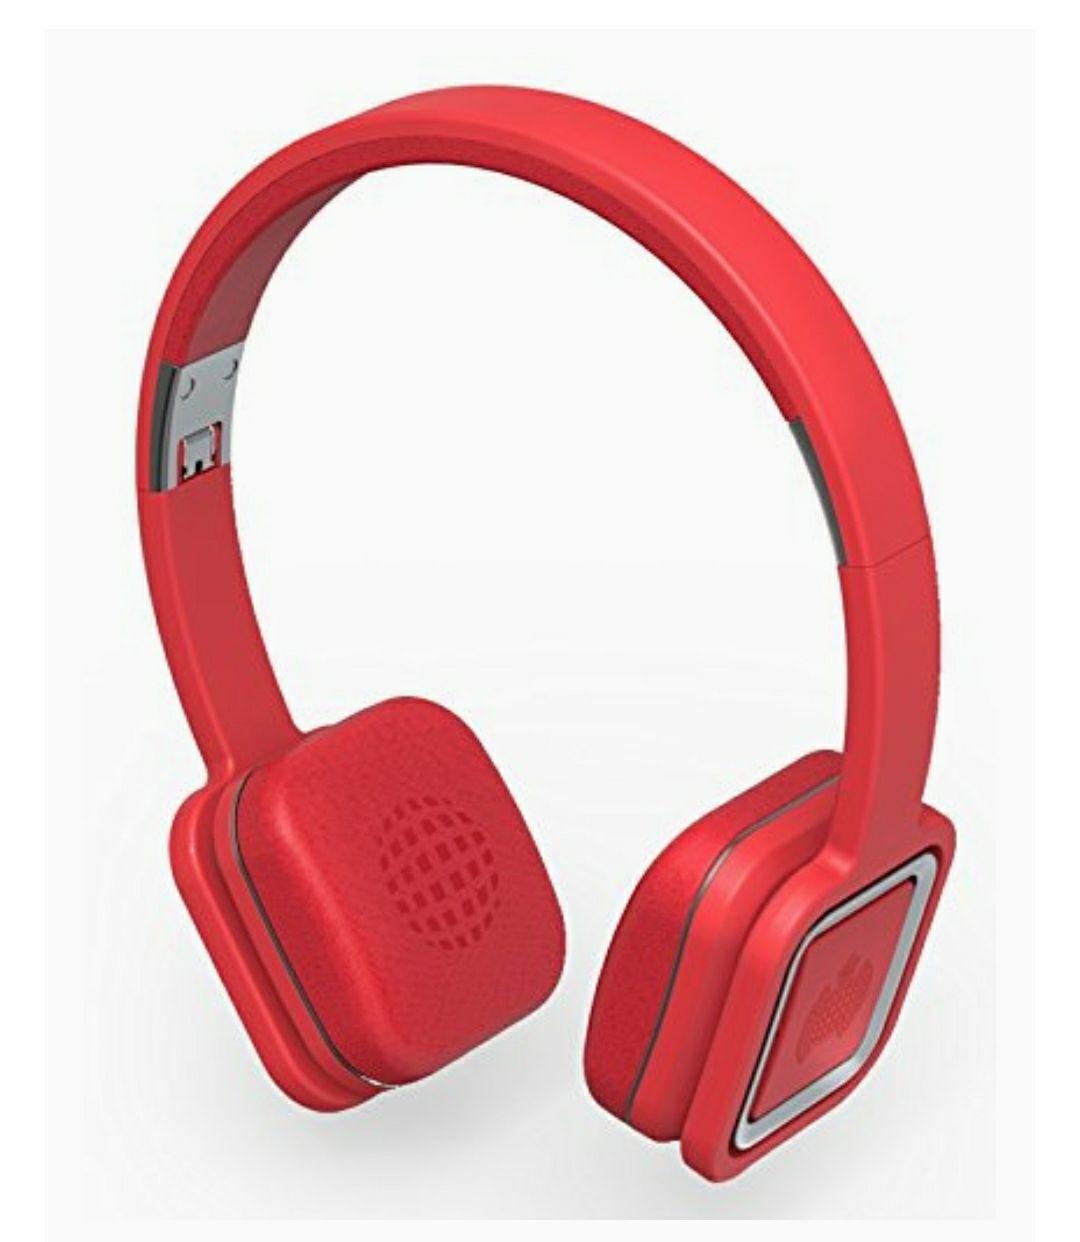 Ministry of Sound Audio On Plus Auriculares plegables inalámbricos Bluetooth/NFC con cancelación de ruido, controles/micrófono